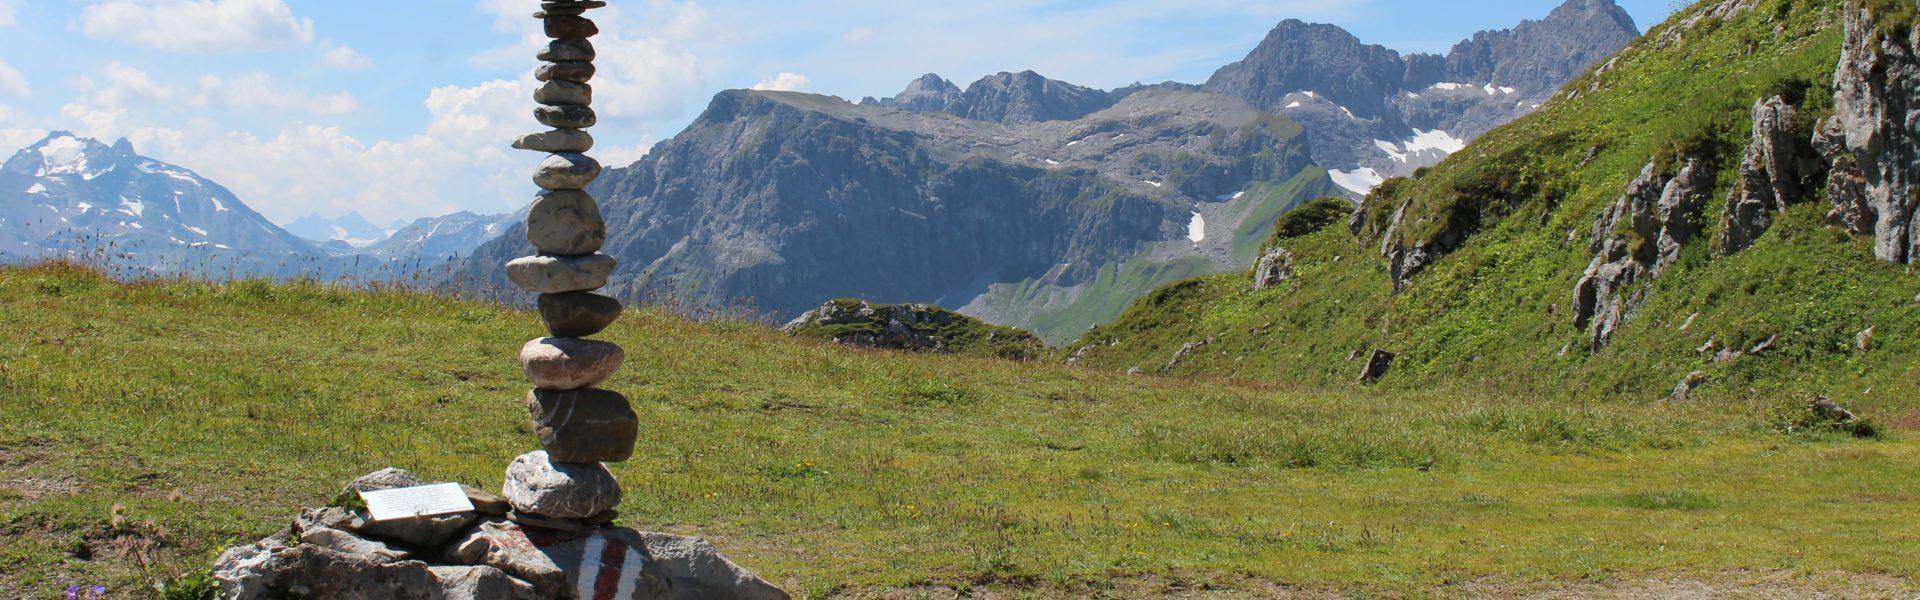 Geoweg am Rüfikop in Lech am Arlberg © Vorarlberg Tourismus